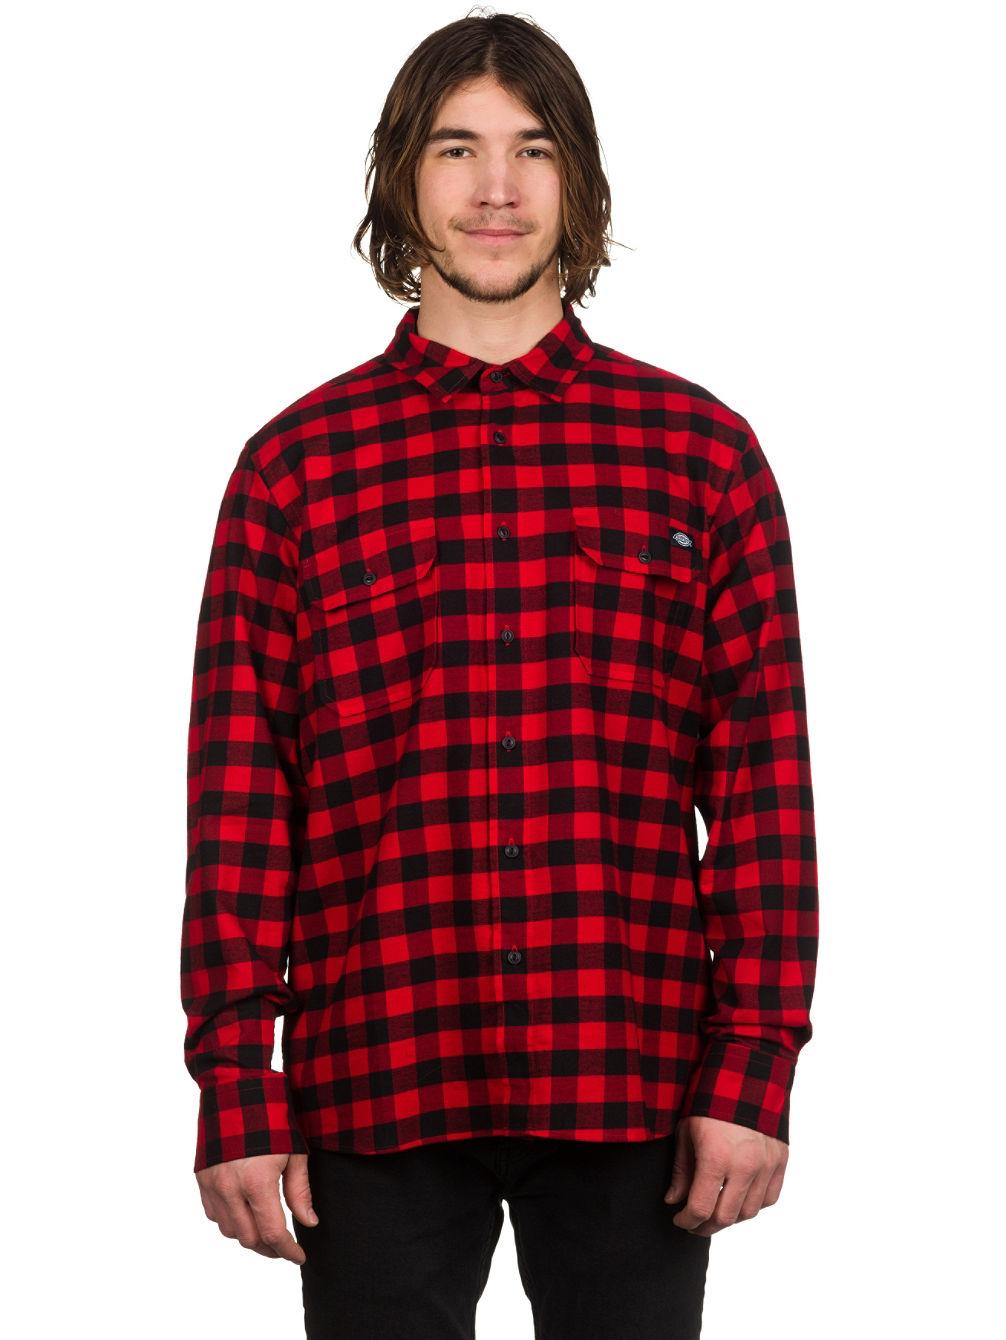 jacksonville-shirt-ls